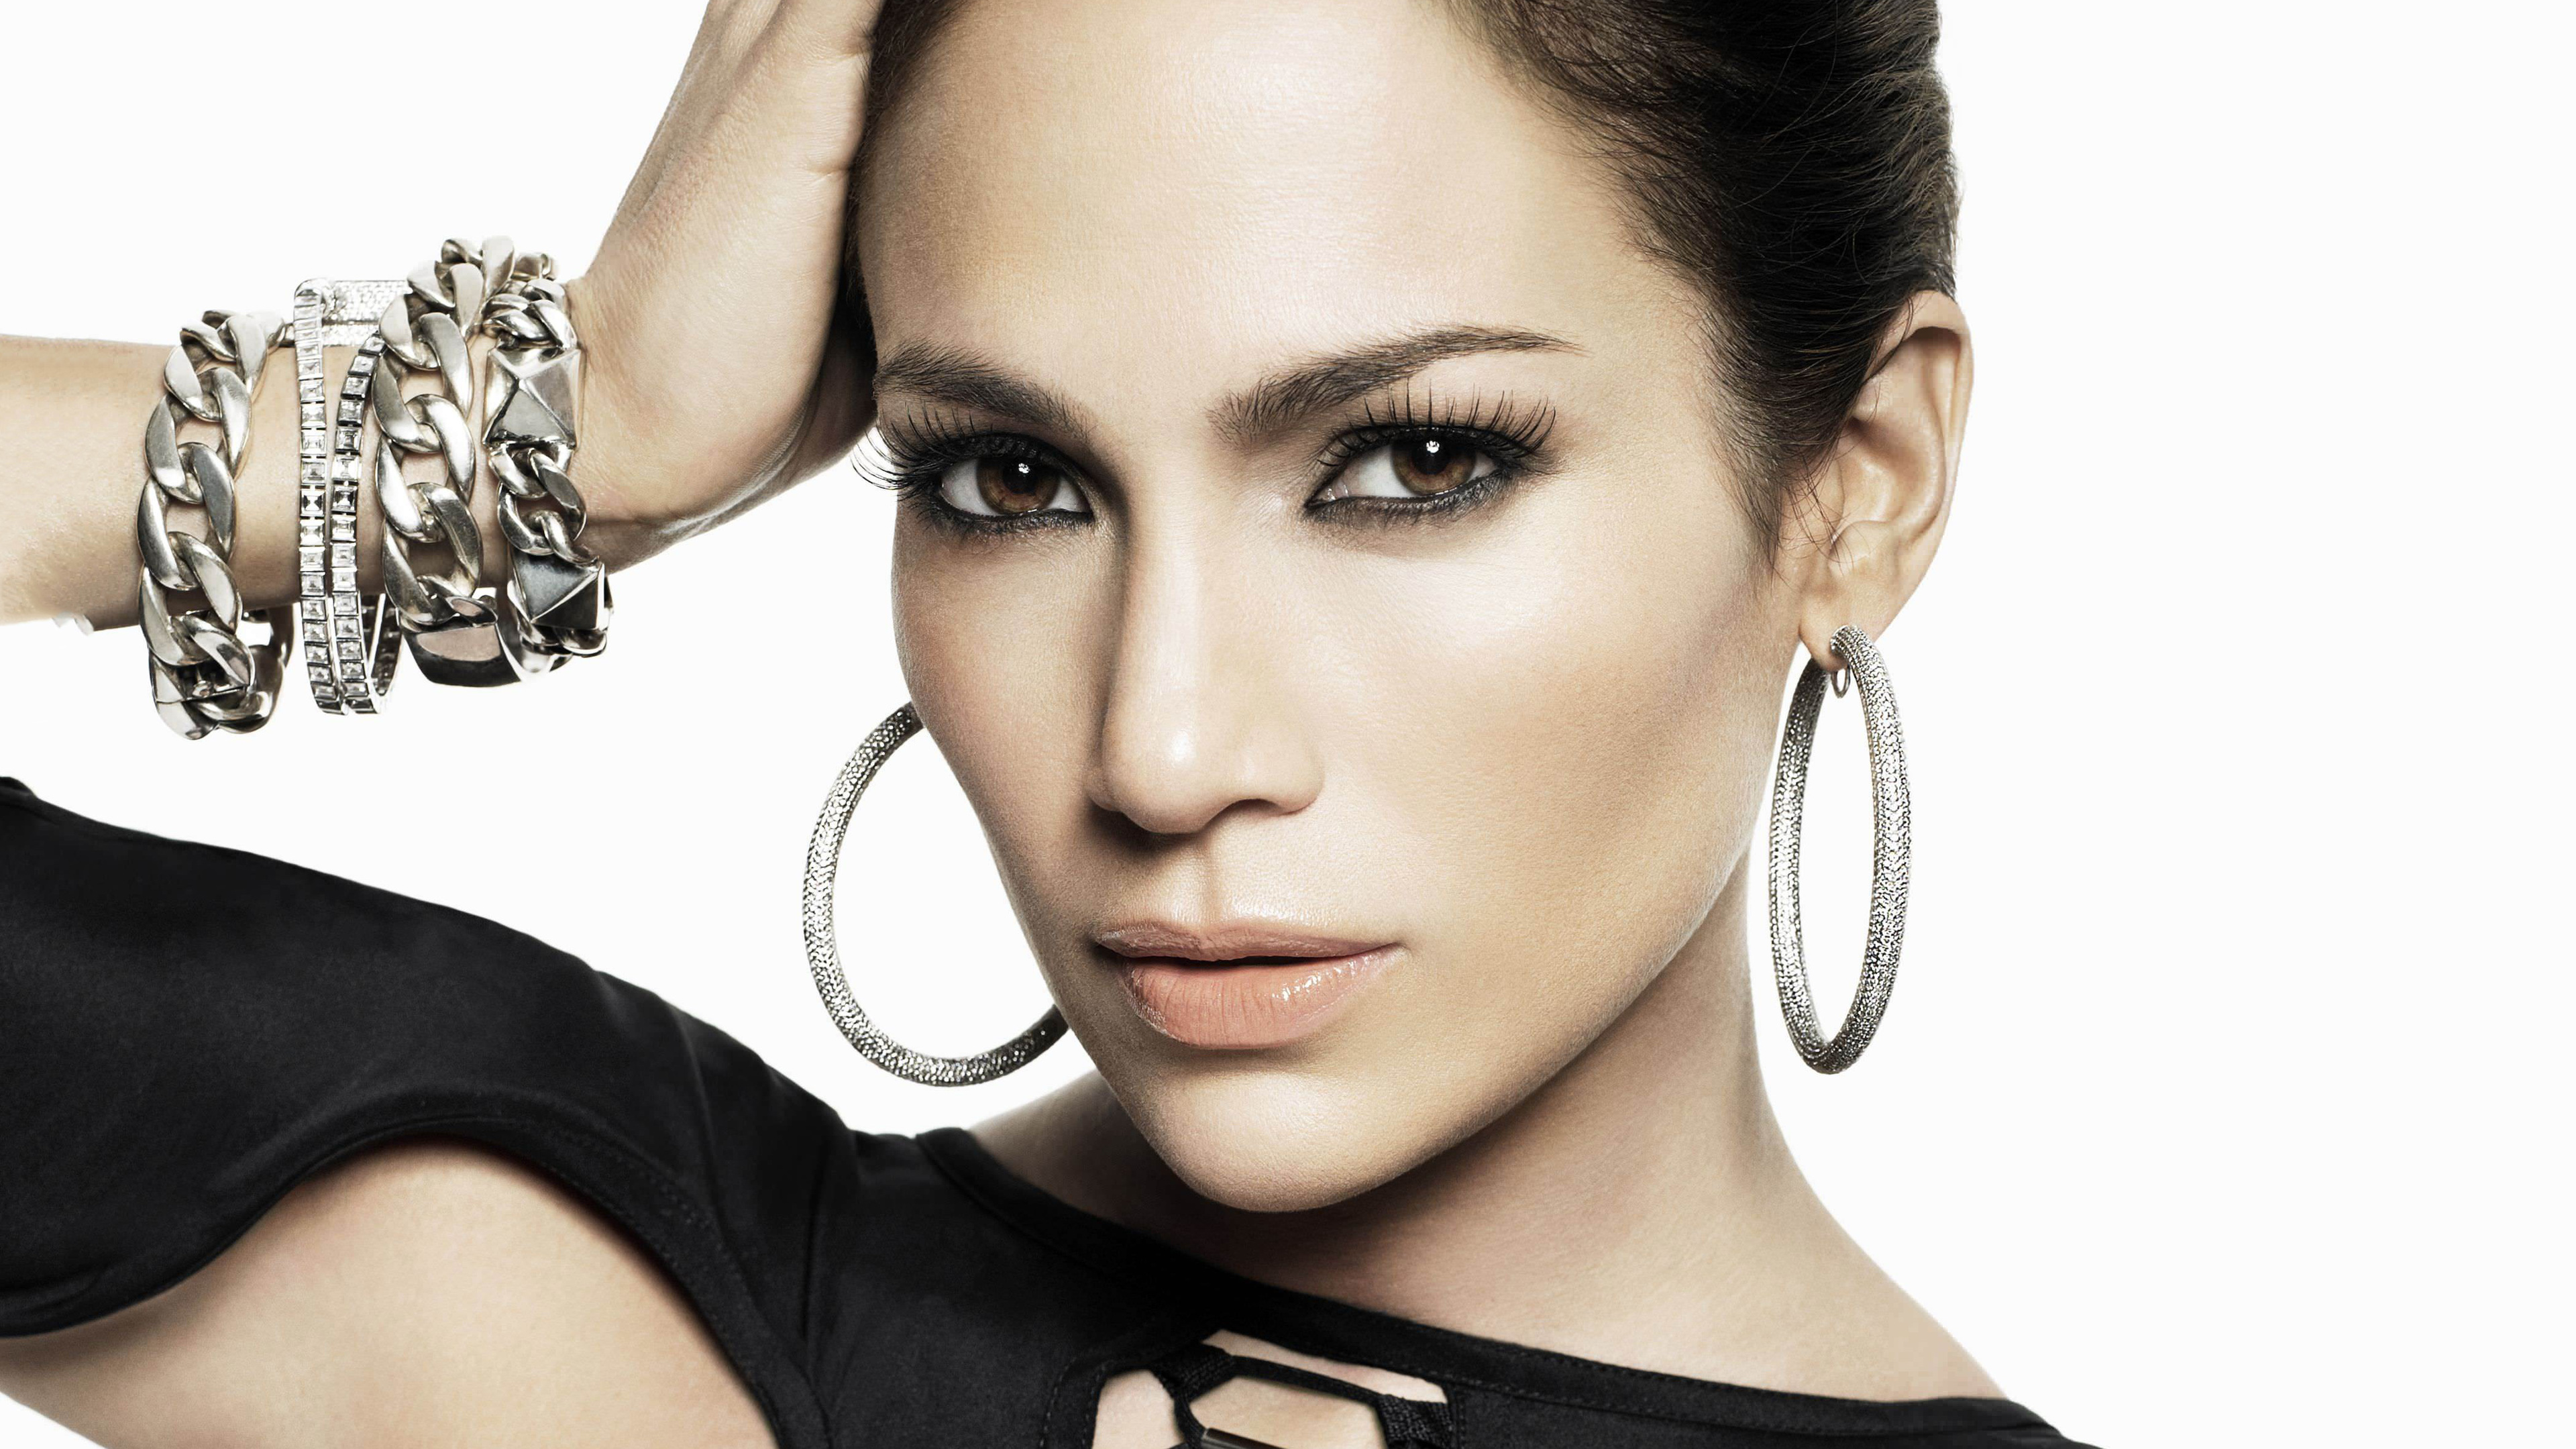 jennifer lopez 2019 4k 1538941308 - Jennifer Lopez 2019 4k - singer wallpapers, music wallpapers, jennifer lopez wallpapers, hd-wallpapers, girls wallpapers, celebrities wallpapers, 4k-wallpapers